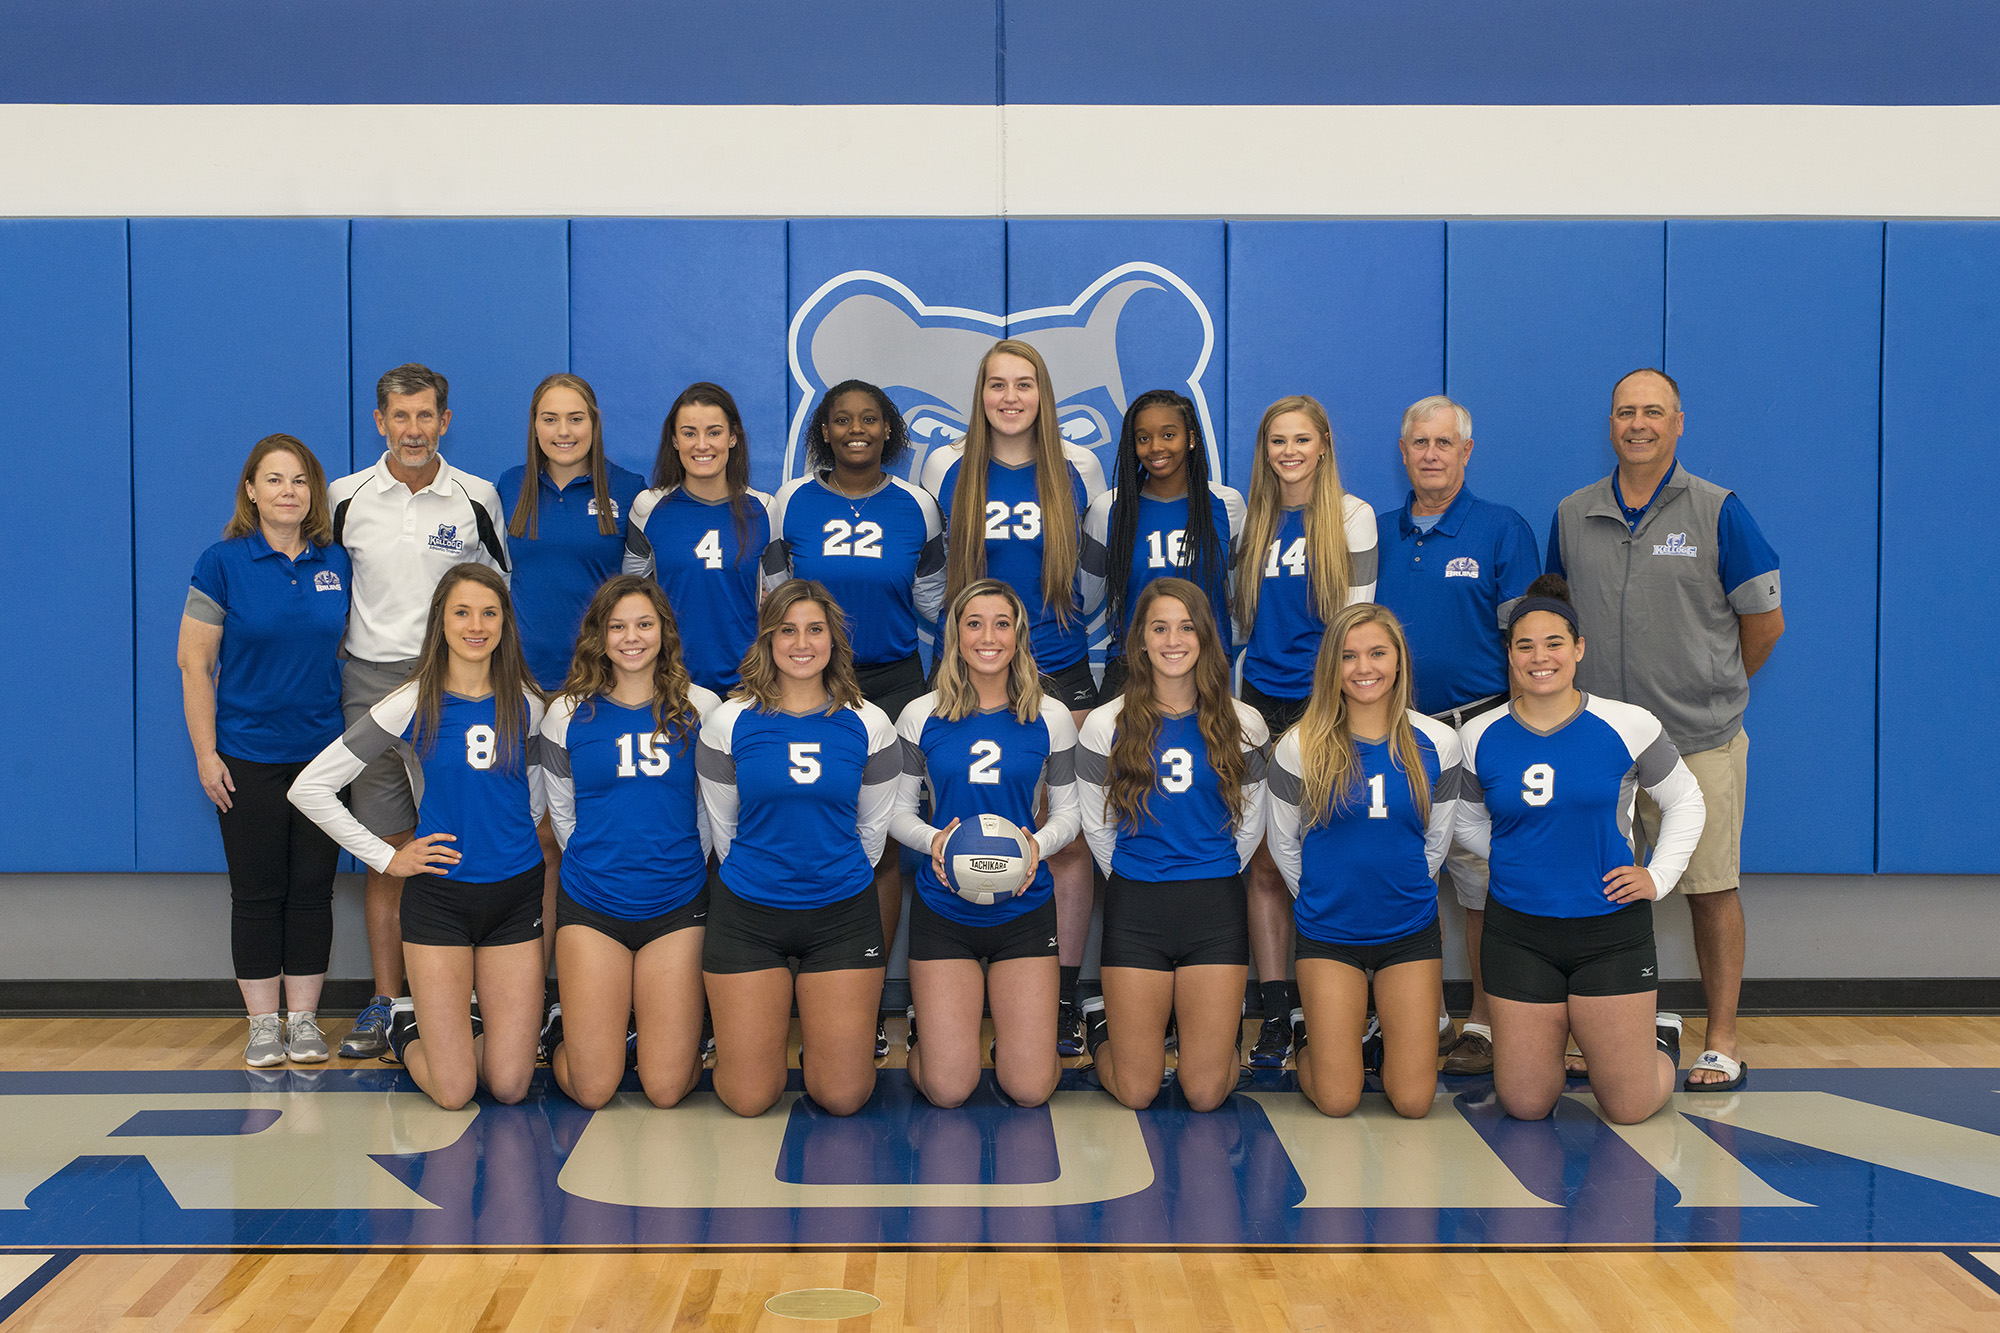 KCC's 2019 women's volleyball team.